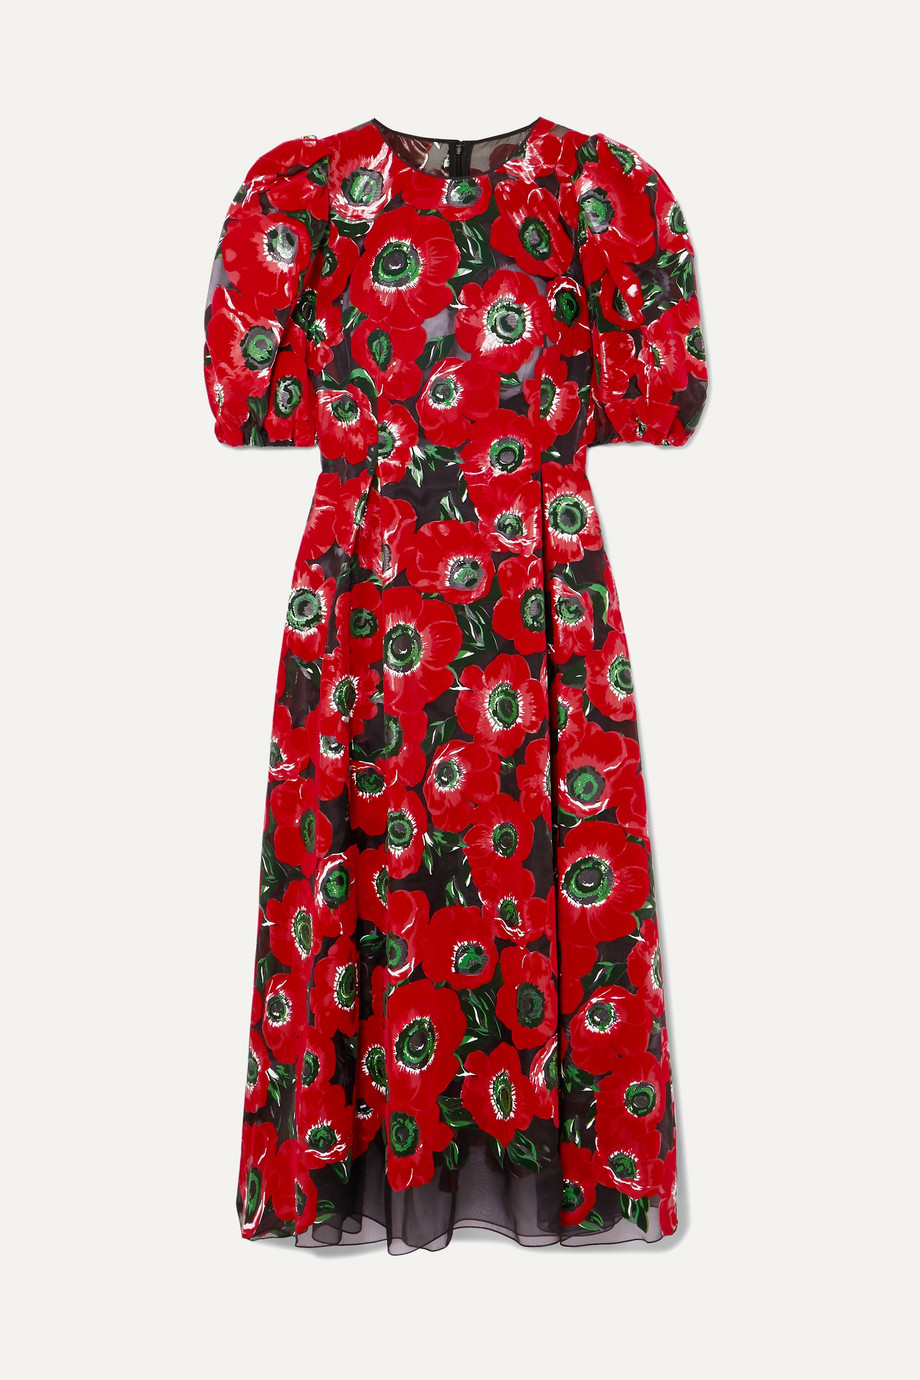 Dolce & Gabbana | Floral-print flocked georgette midi dress | NET-A-PORTER.COM